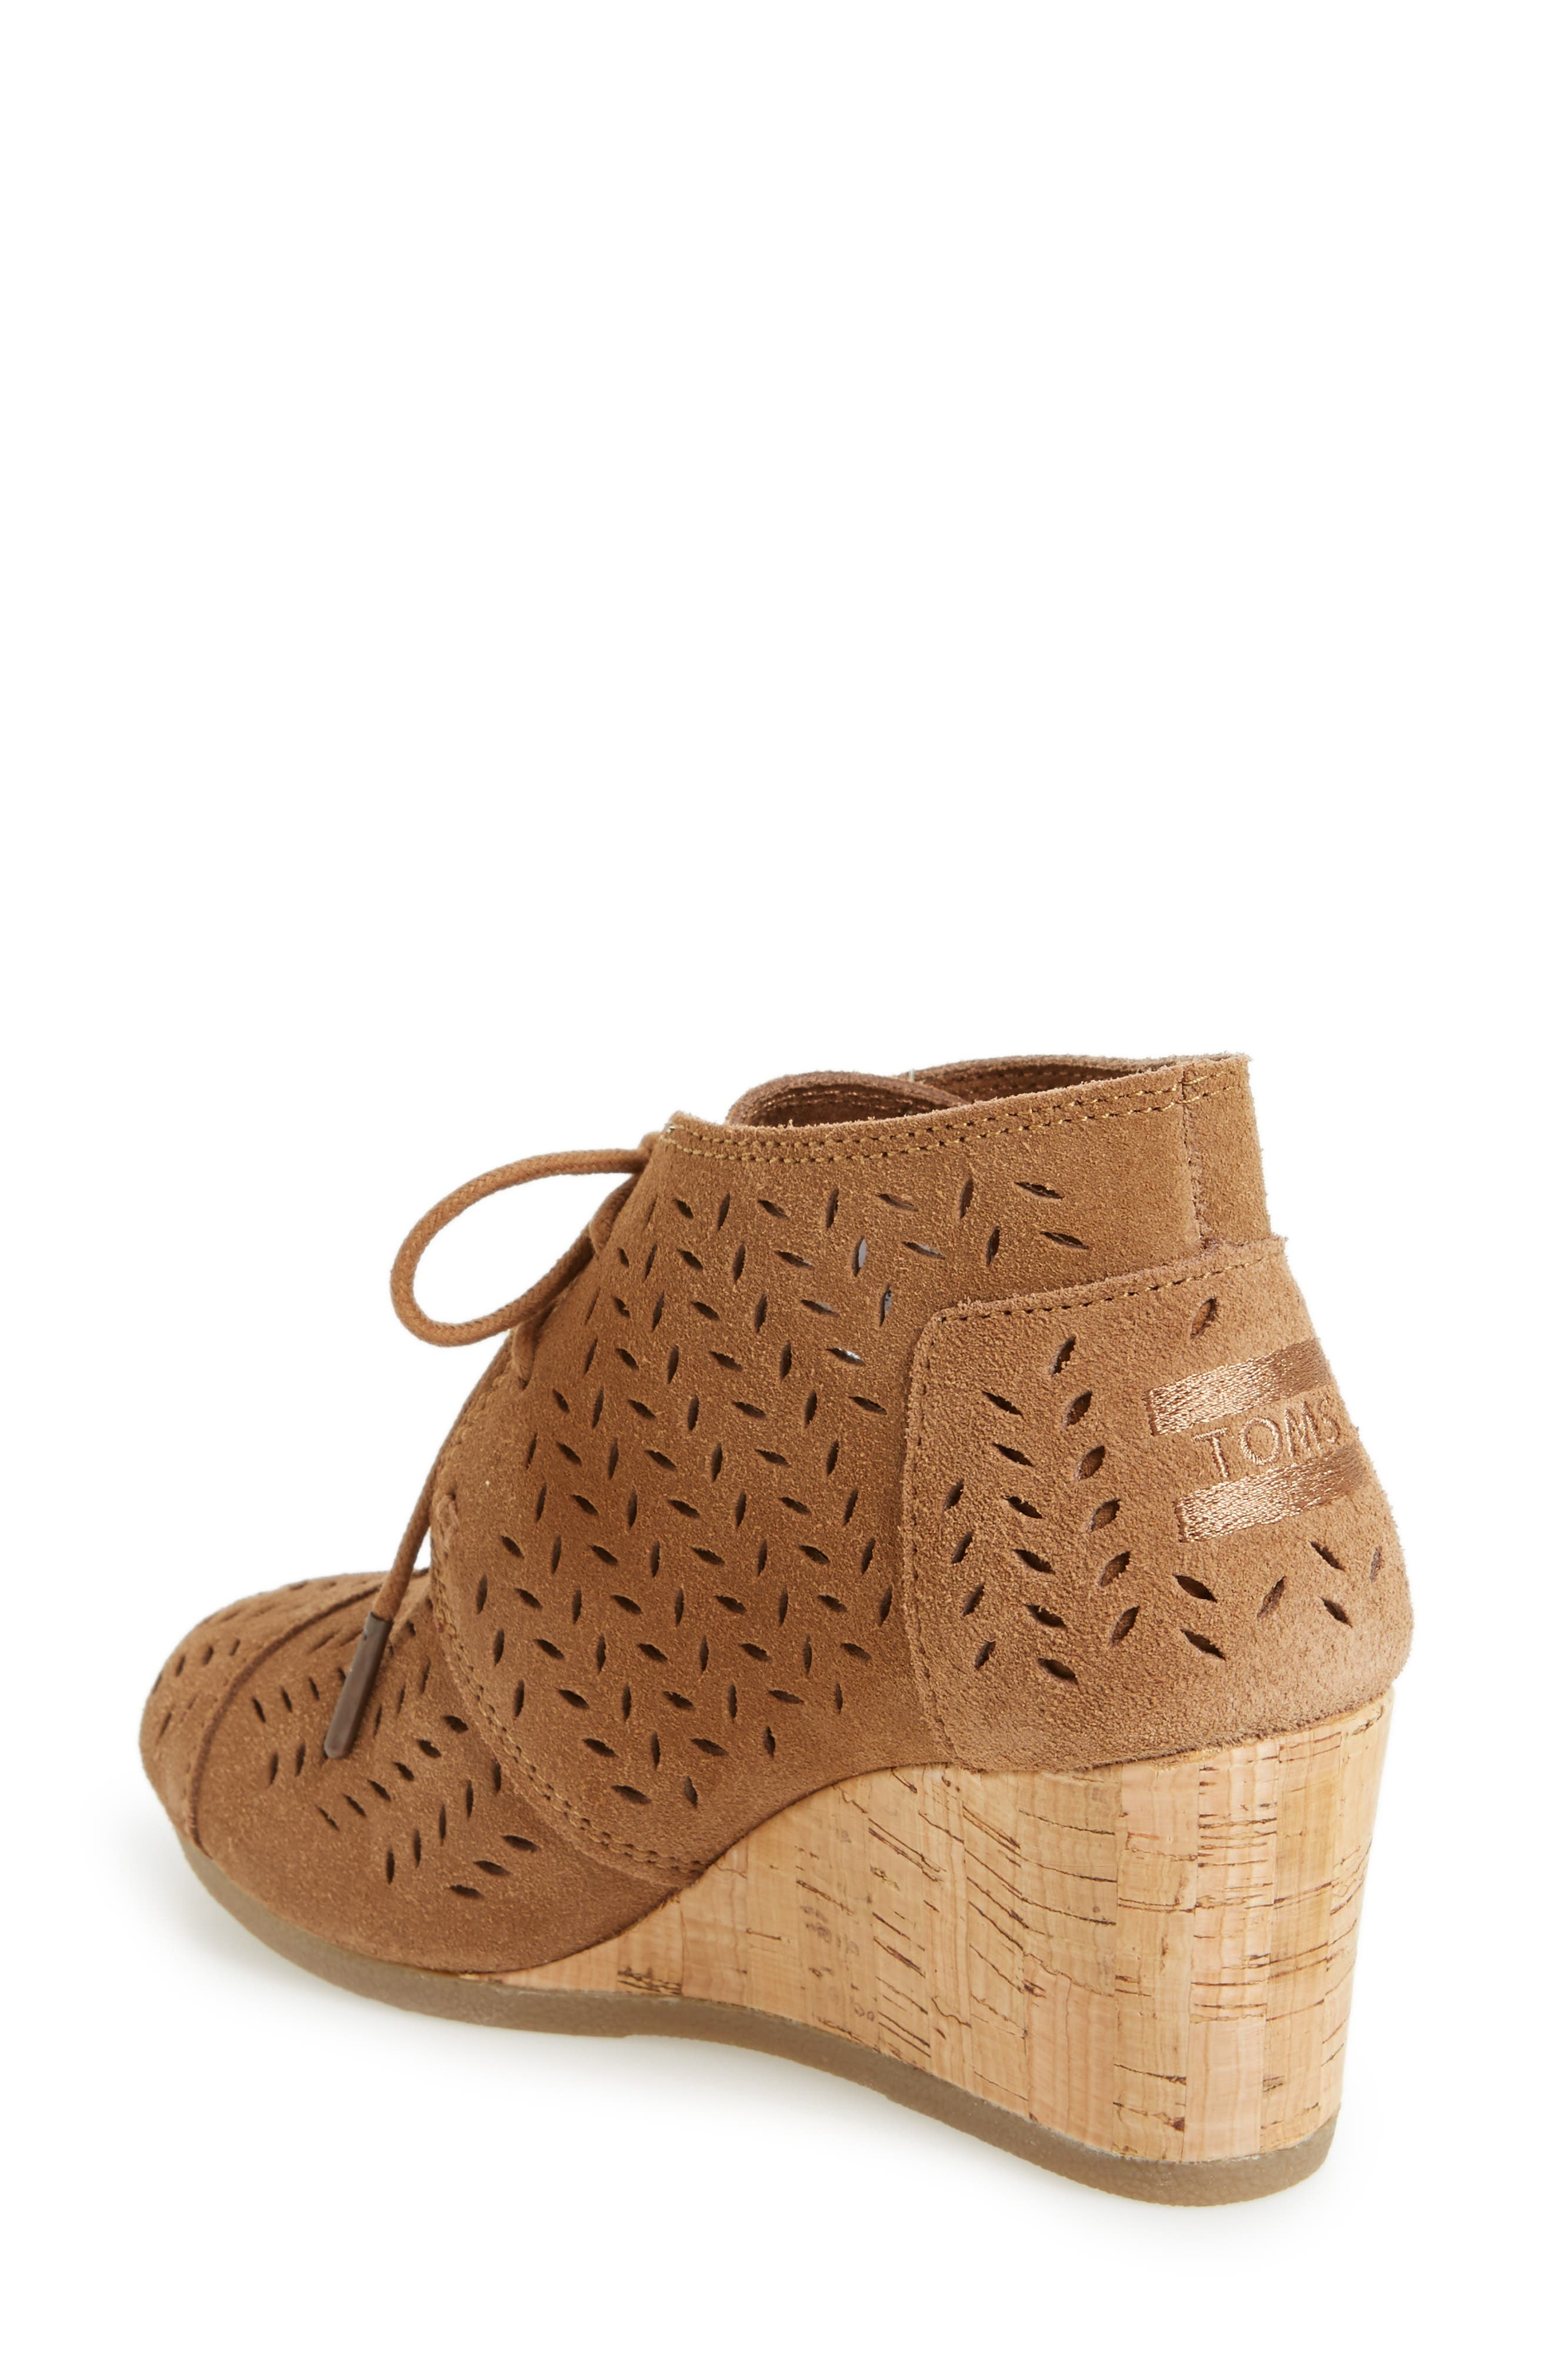 Alternate Image 2  - TOMS Perforated Chukka Wedge Boot (Women)